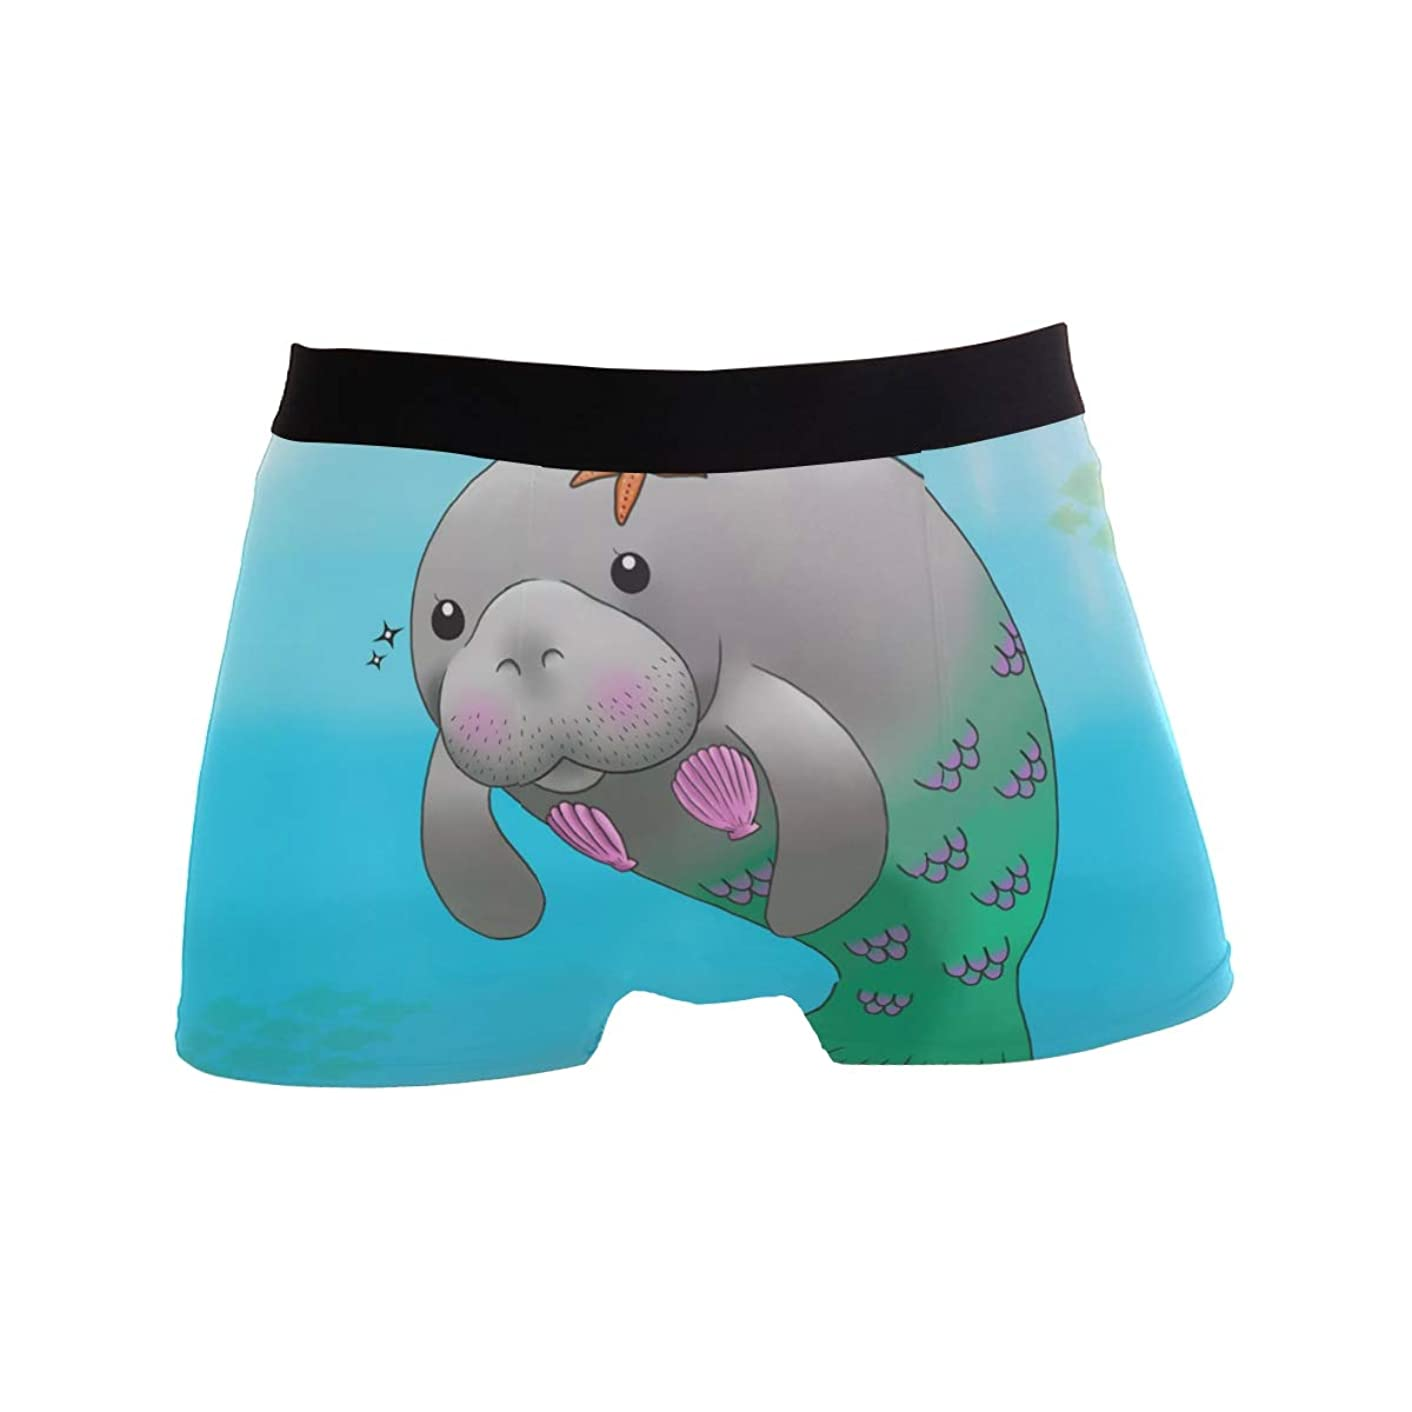 Manatee Mermaid Men's Boxer Briefs Regular Soft Breathable Comfortable Underwear